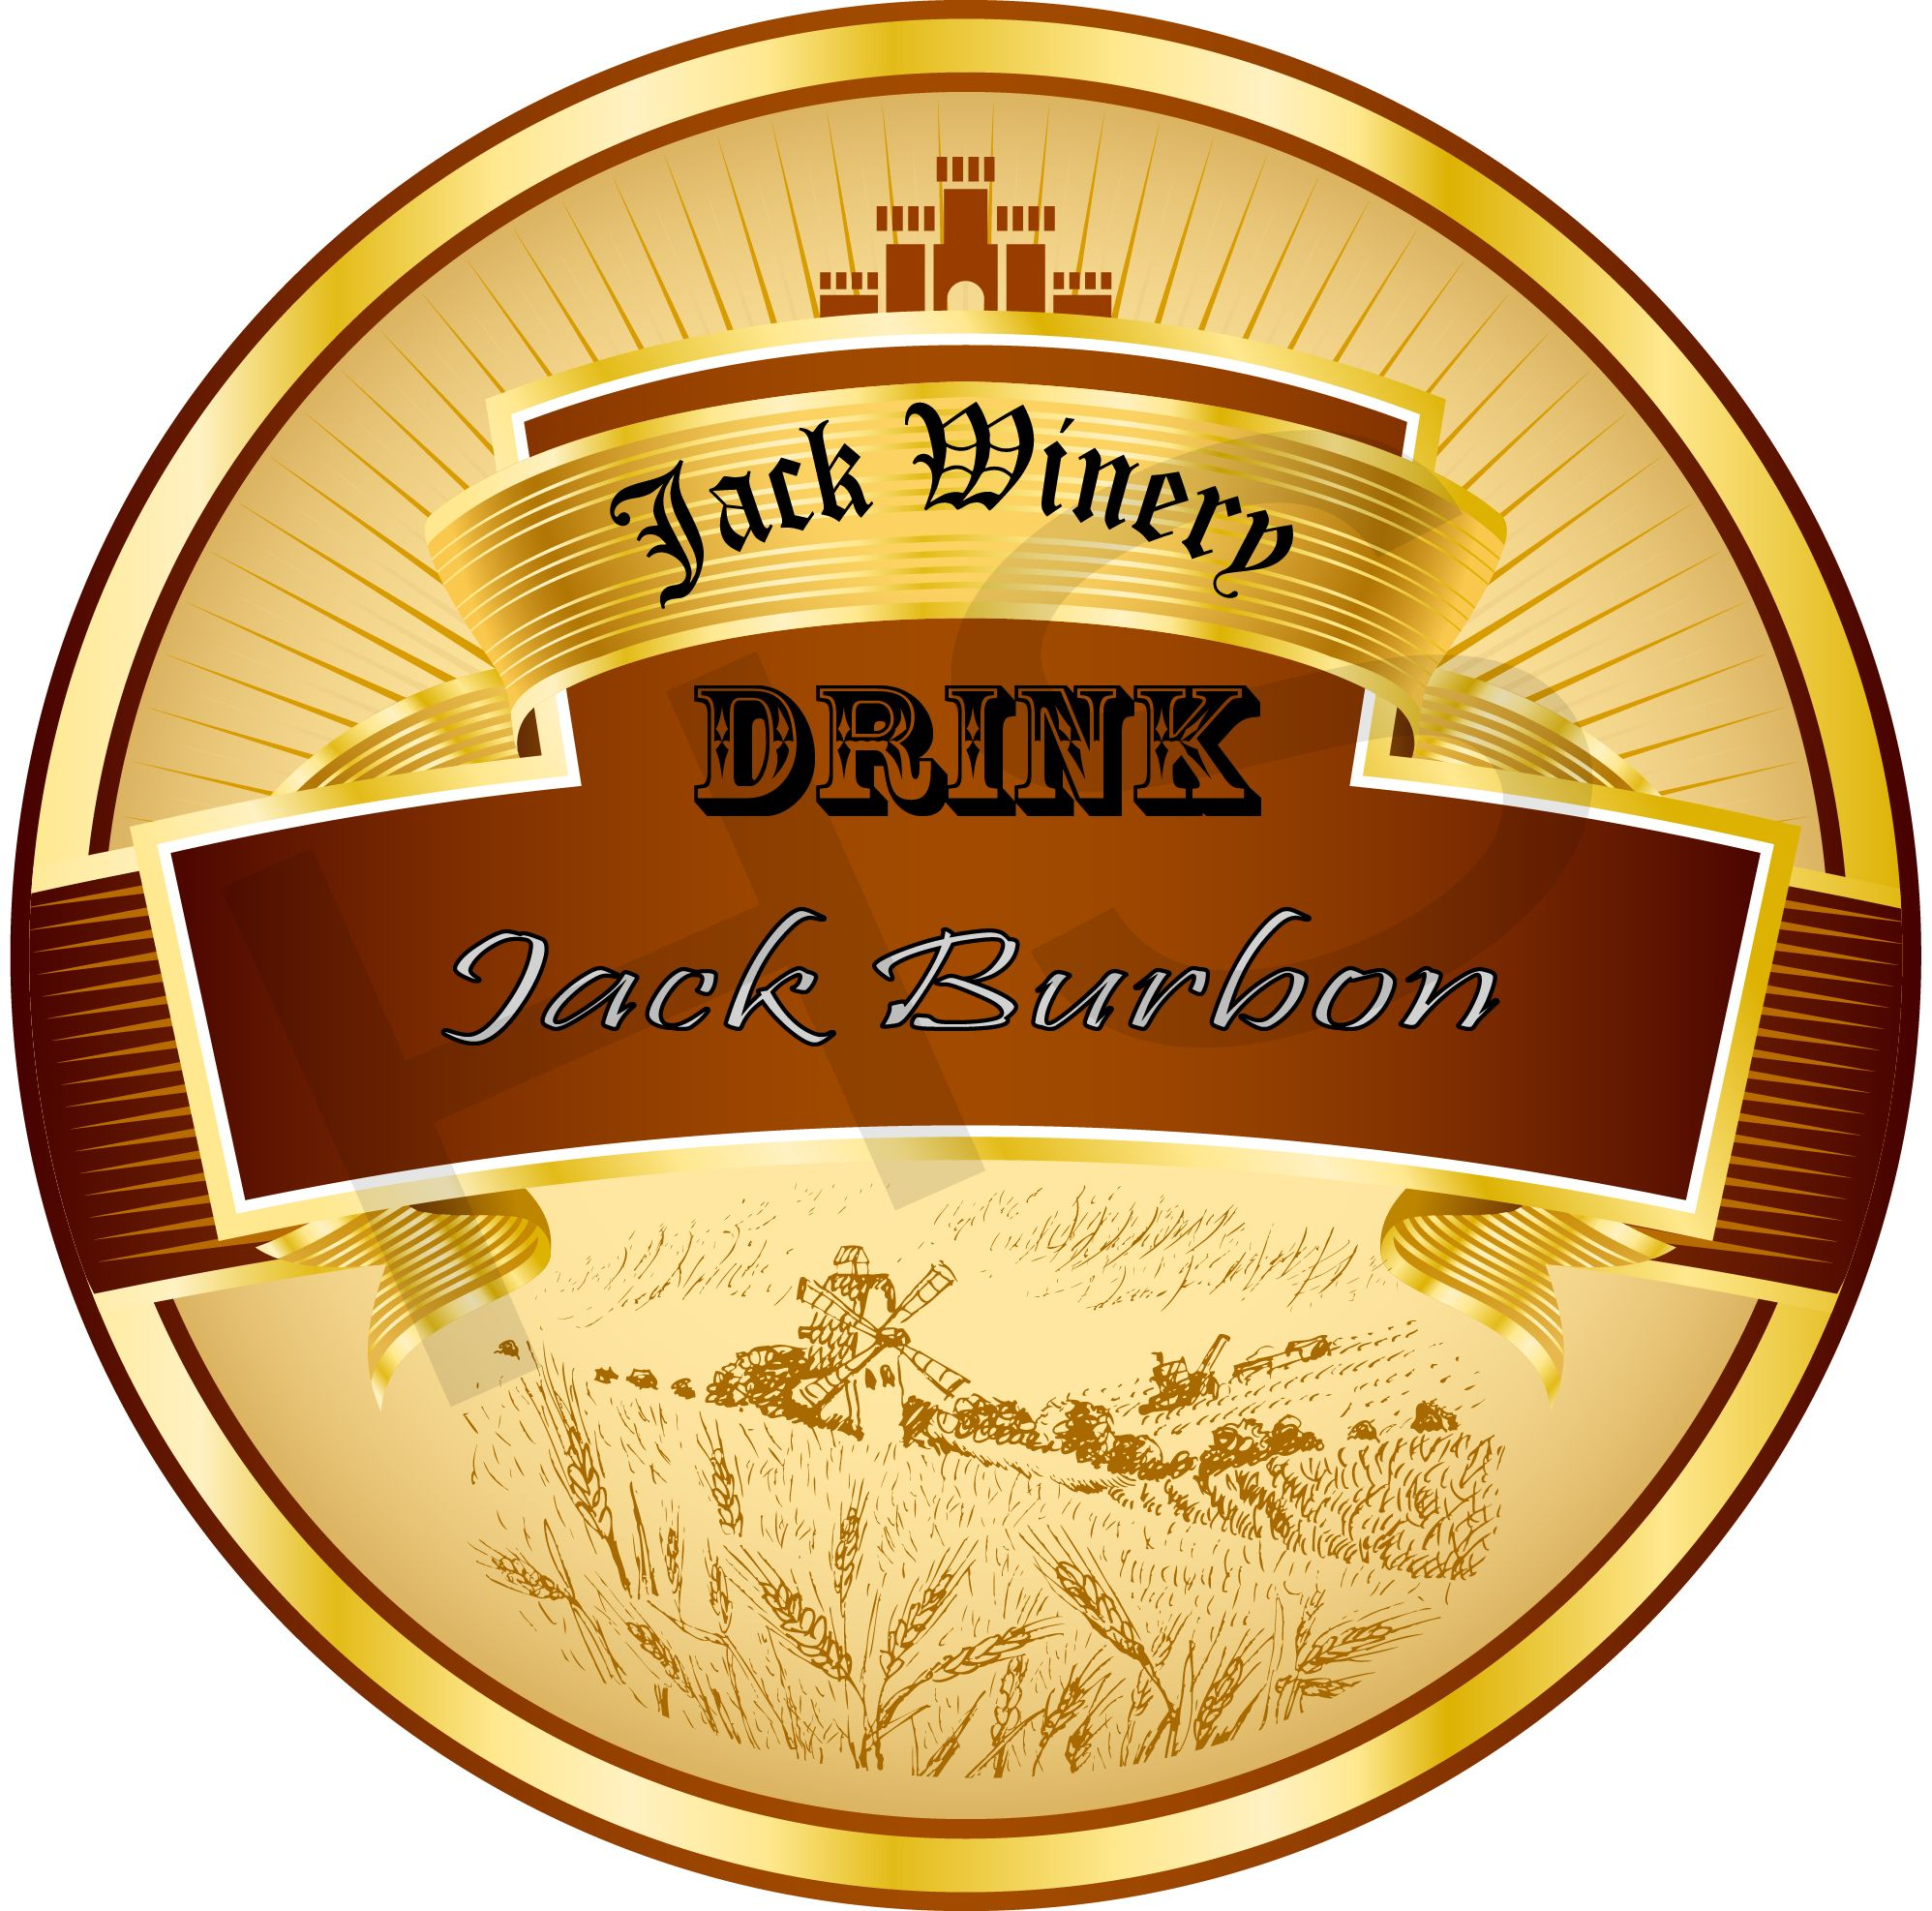 Jack Winery